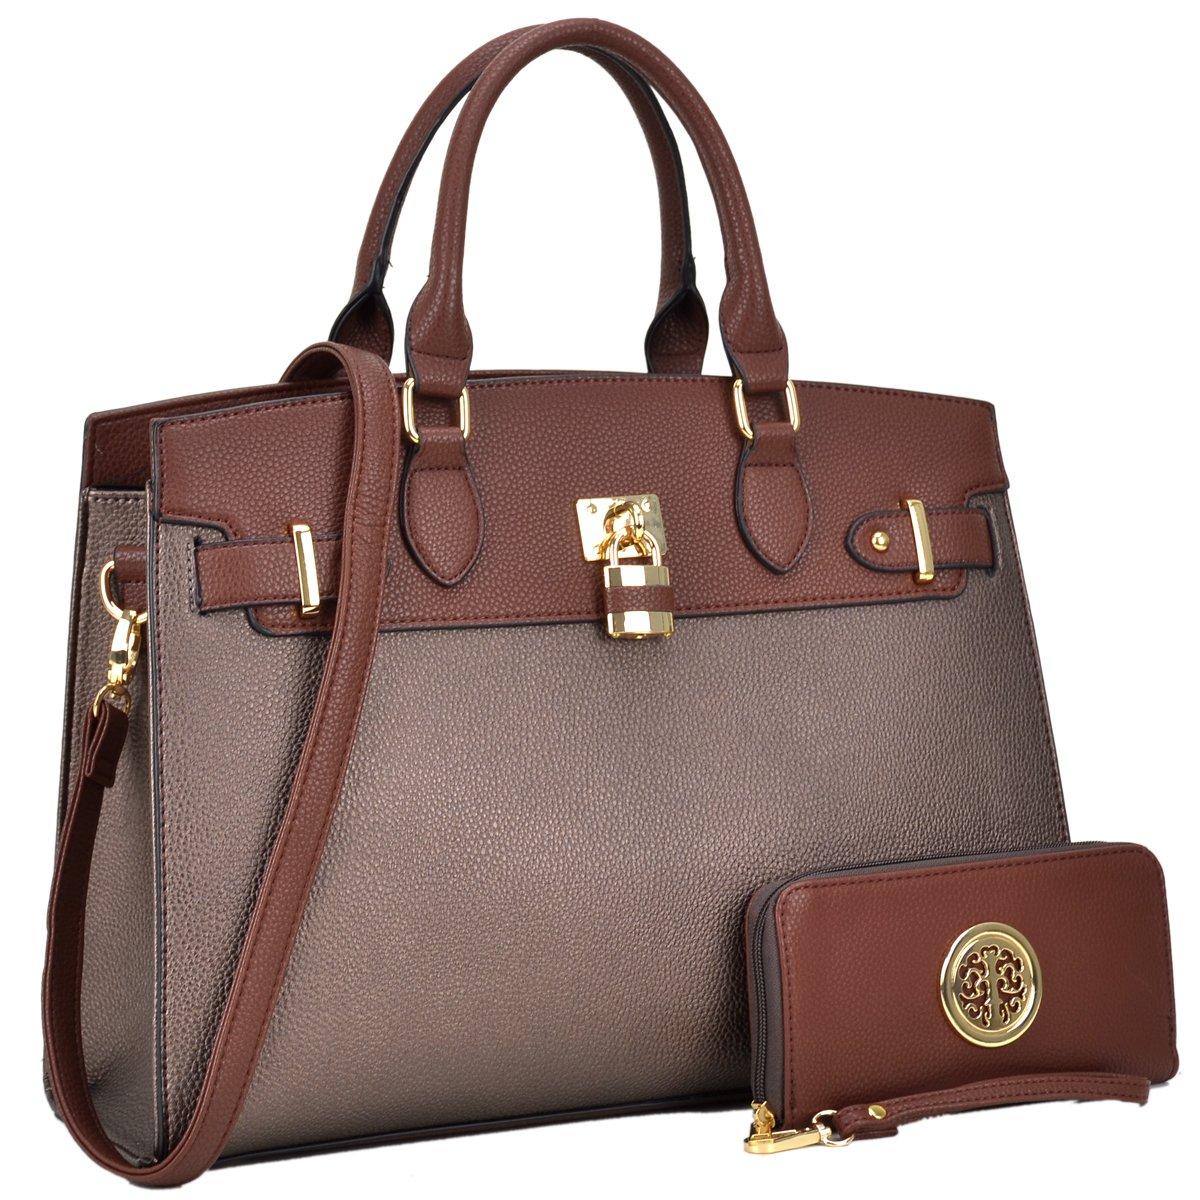 MMK collection Fashion Women Purses and Handbags Ladies Designer Satchel Handbag Tote Bag Shoulder Bags with coin purse (Z-6876-CF)